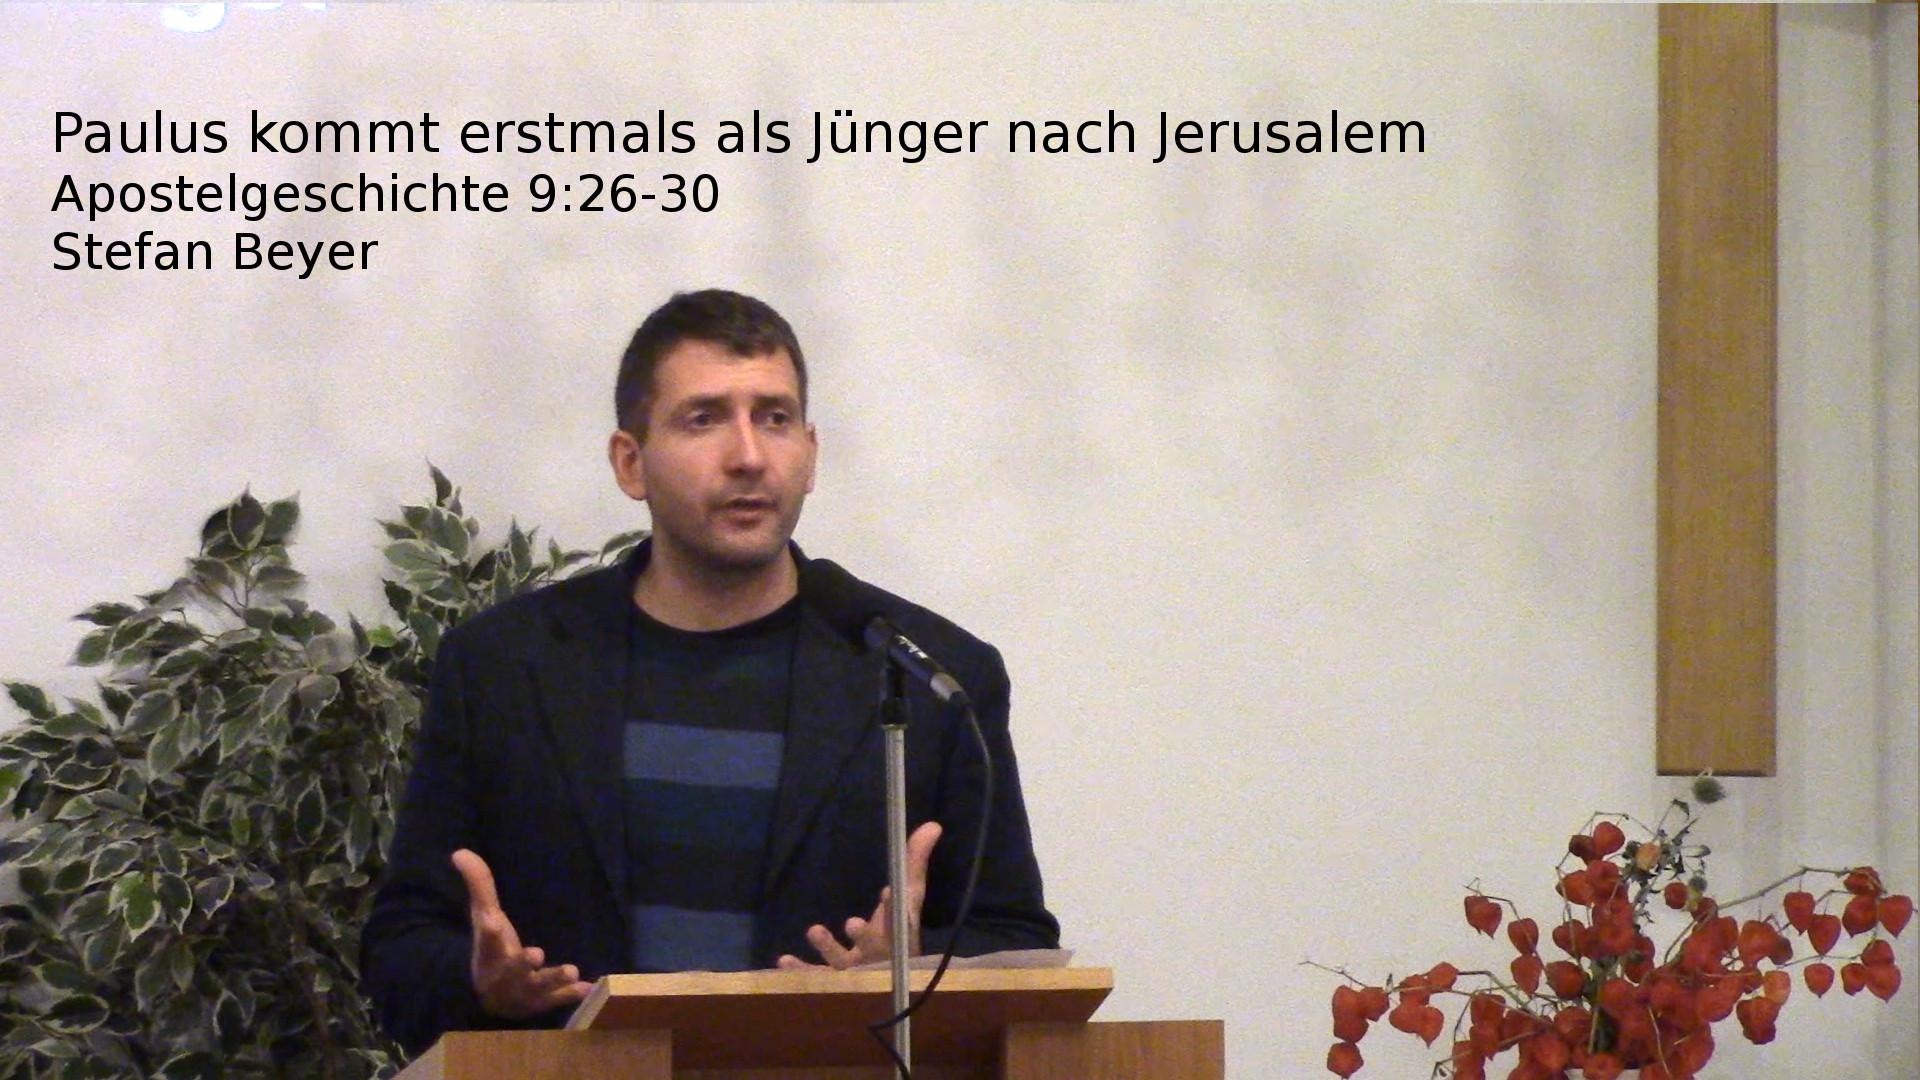 Apostelgeschichte 9,26-30 – Paulus kommt erstmals als Jünger nach Jerusalem